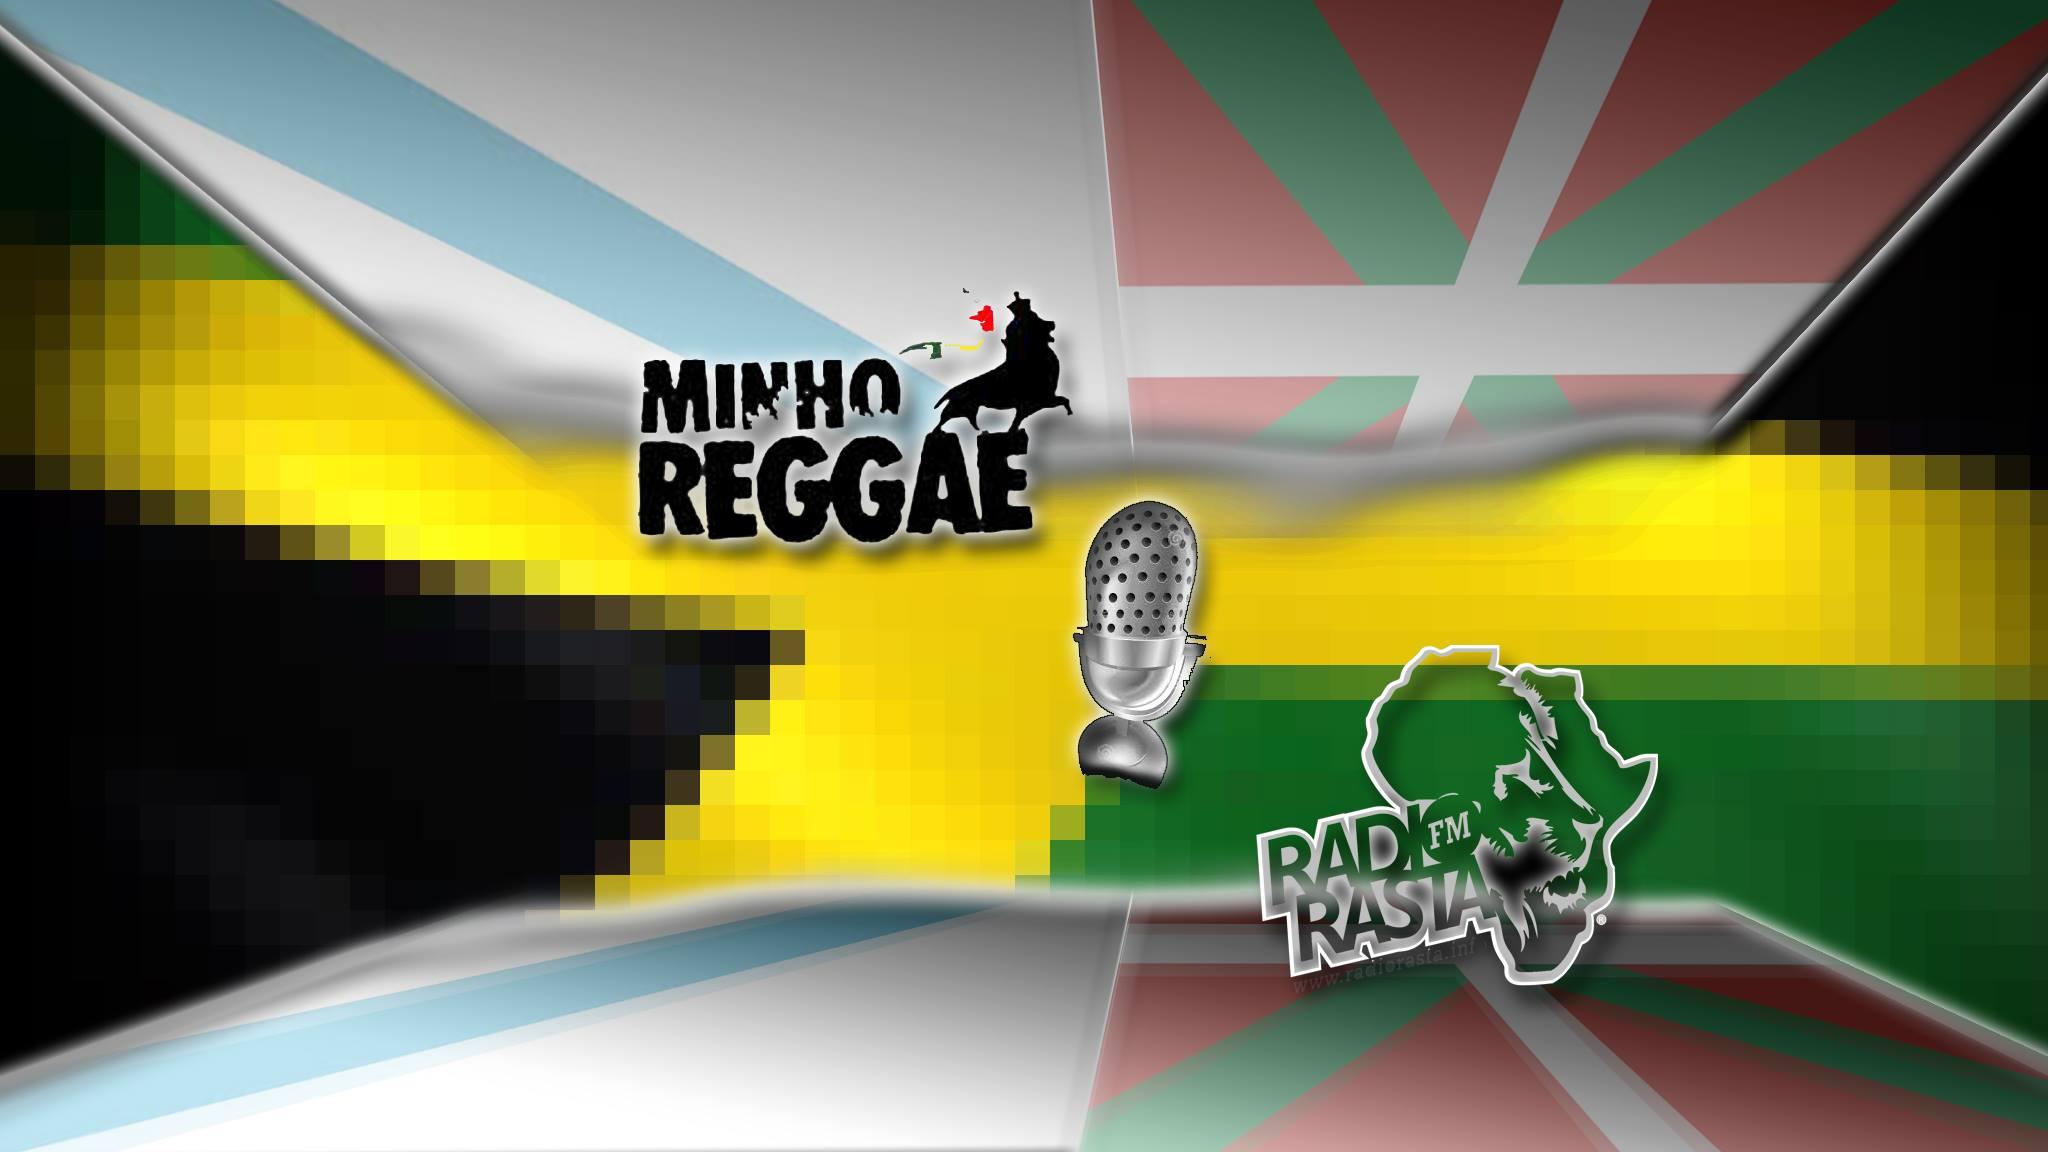 minho-reggae galizia radiorasta